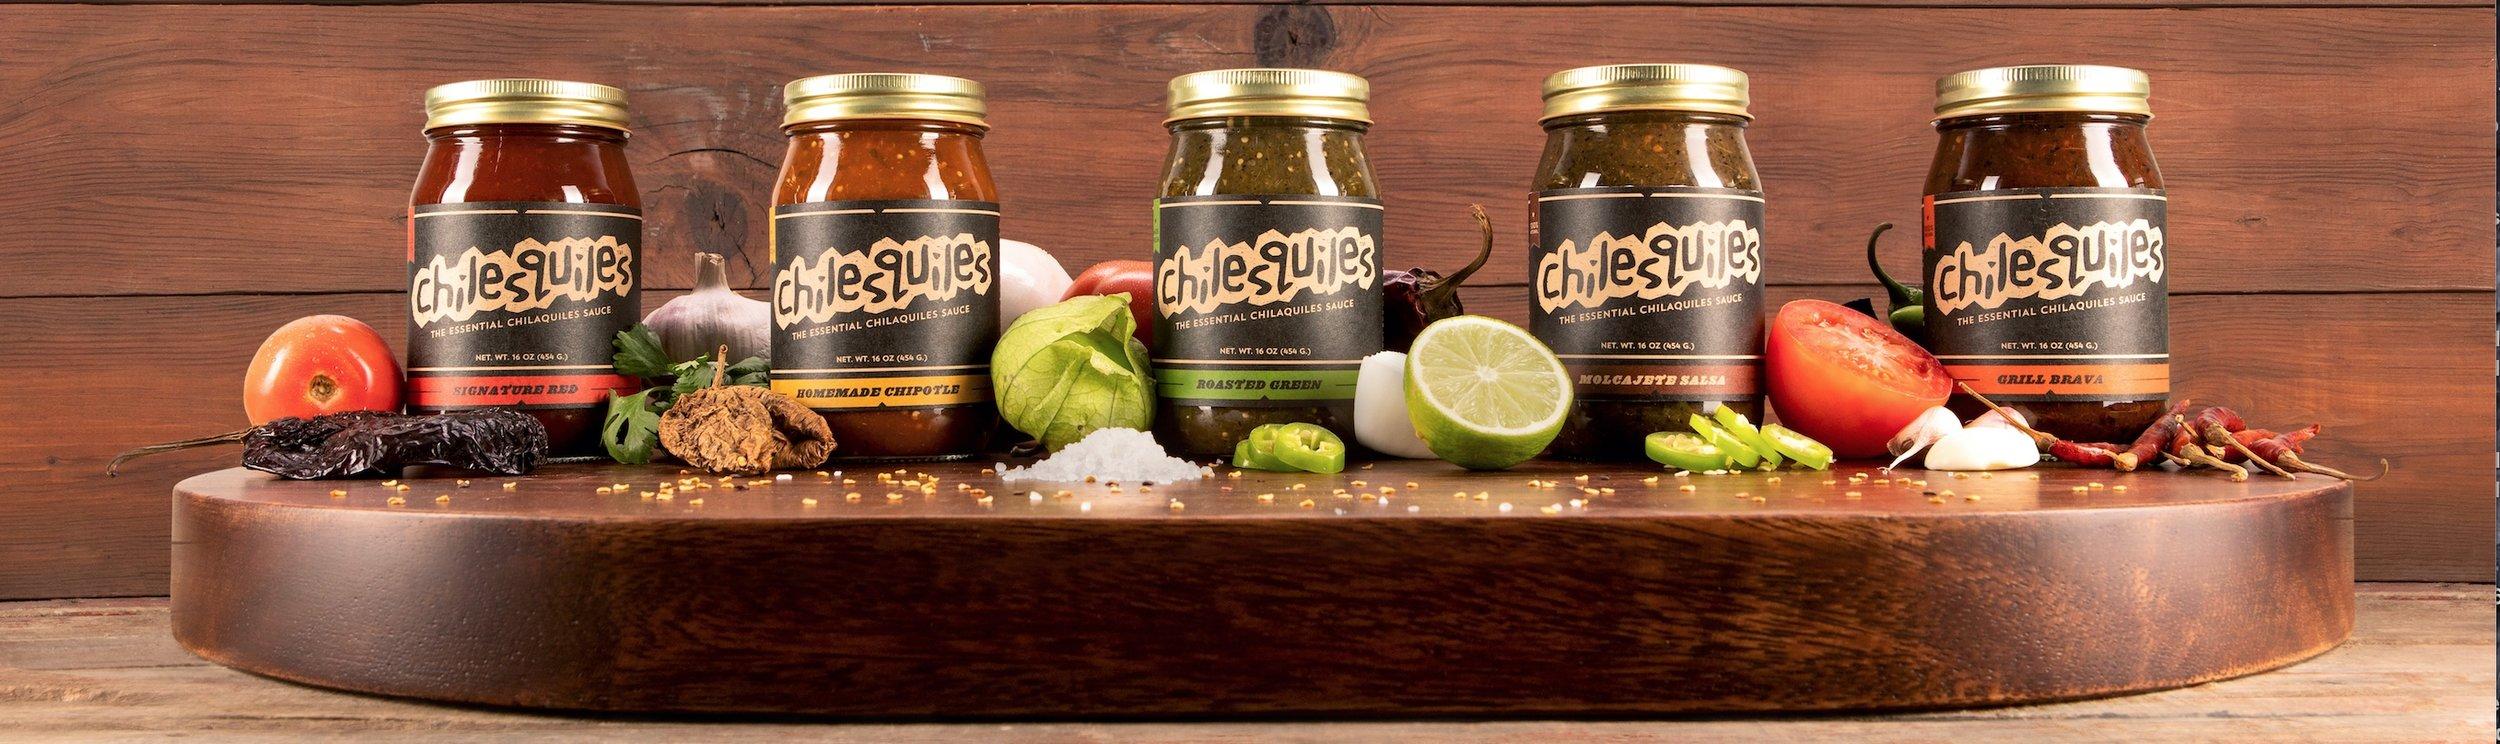 Chilesquiles salsa and sauce, spcialty salsa, fresh salsas, artisan sauces, online farmers market